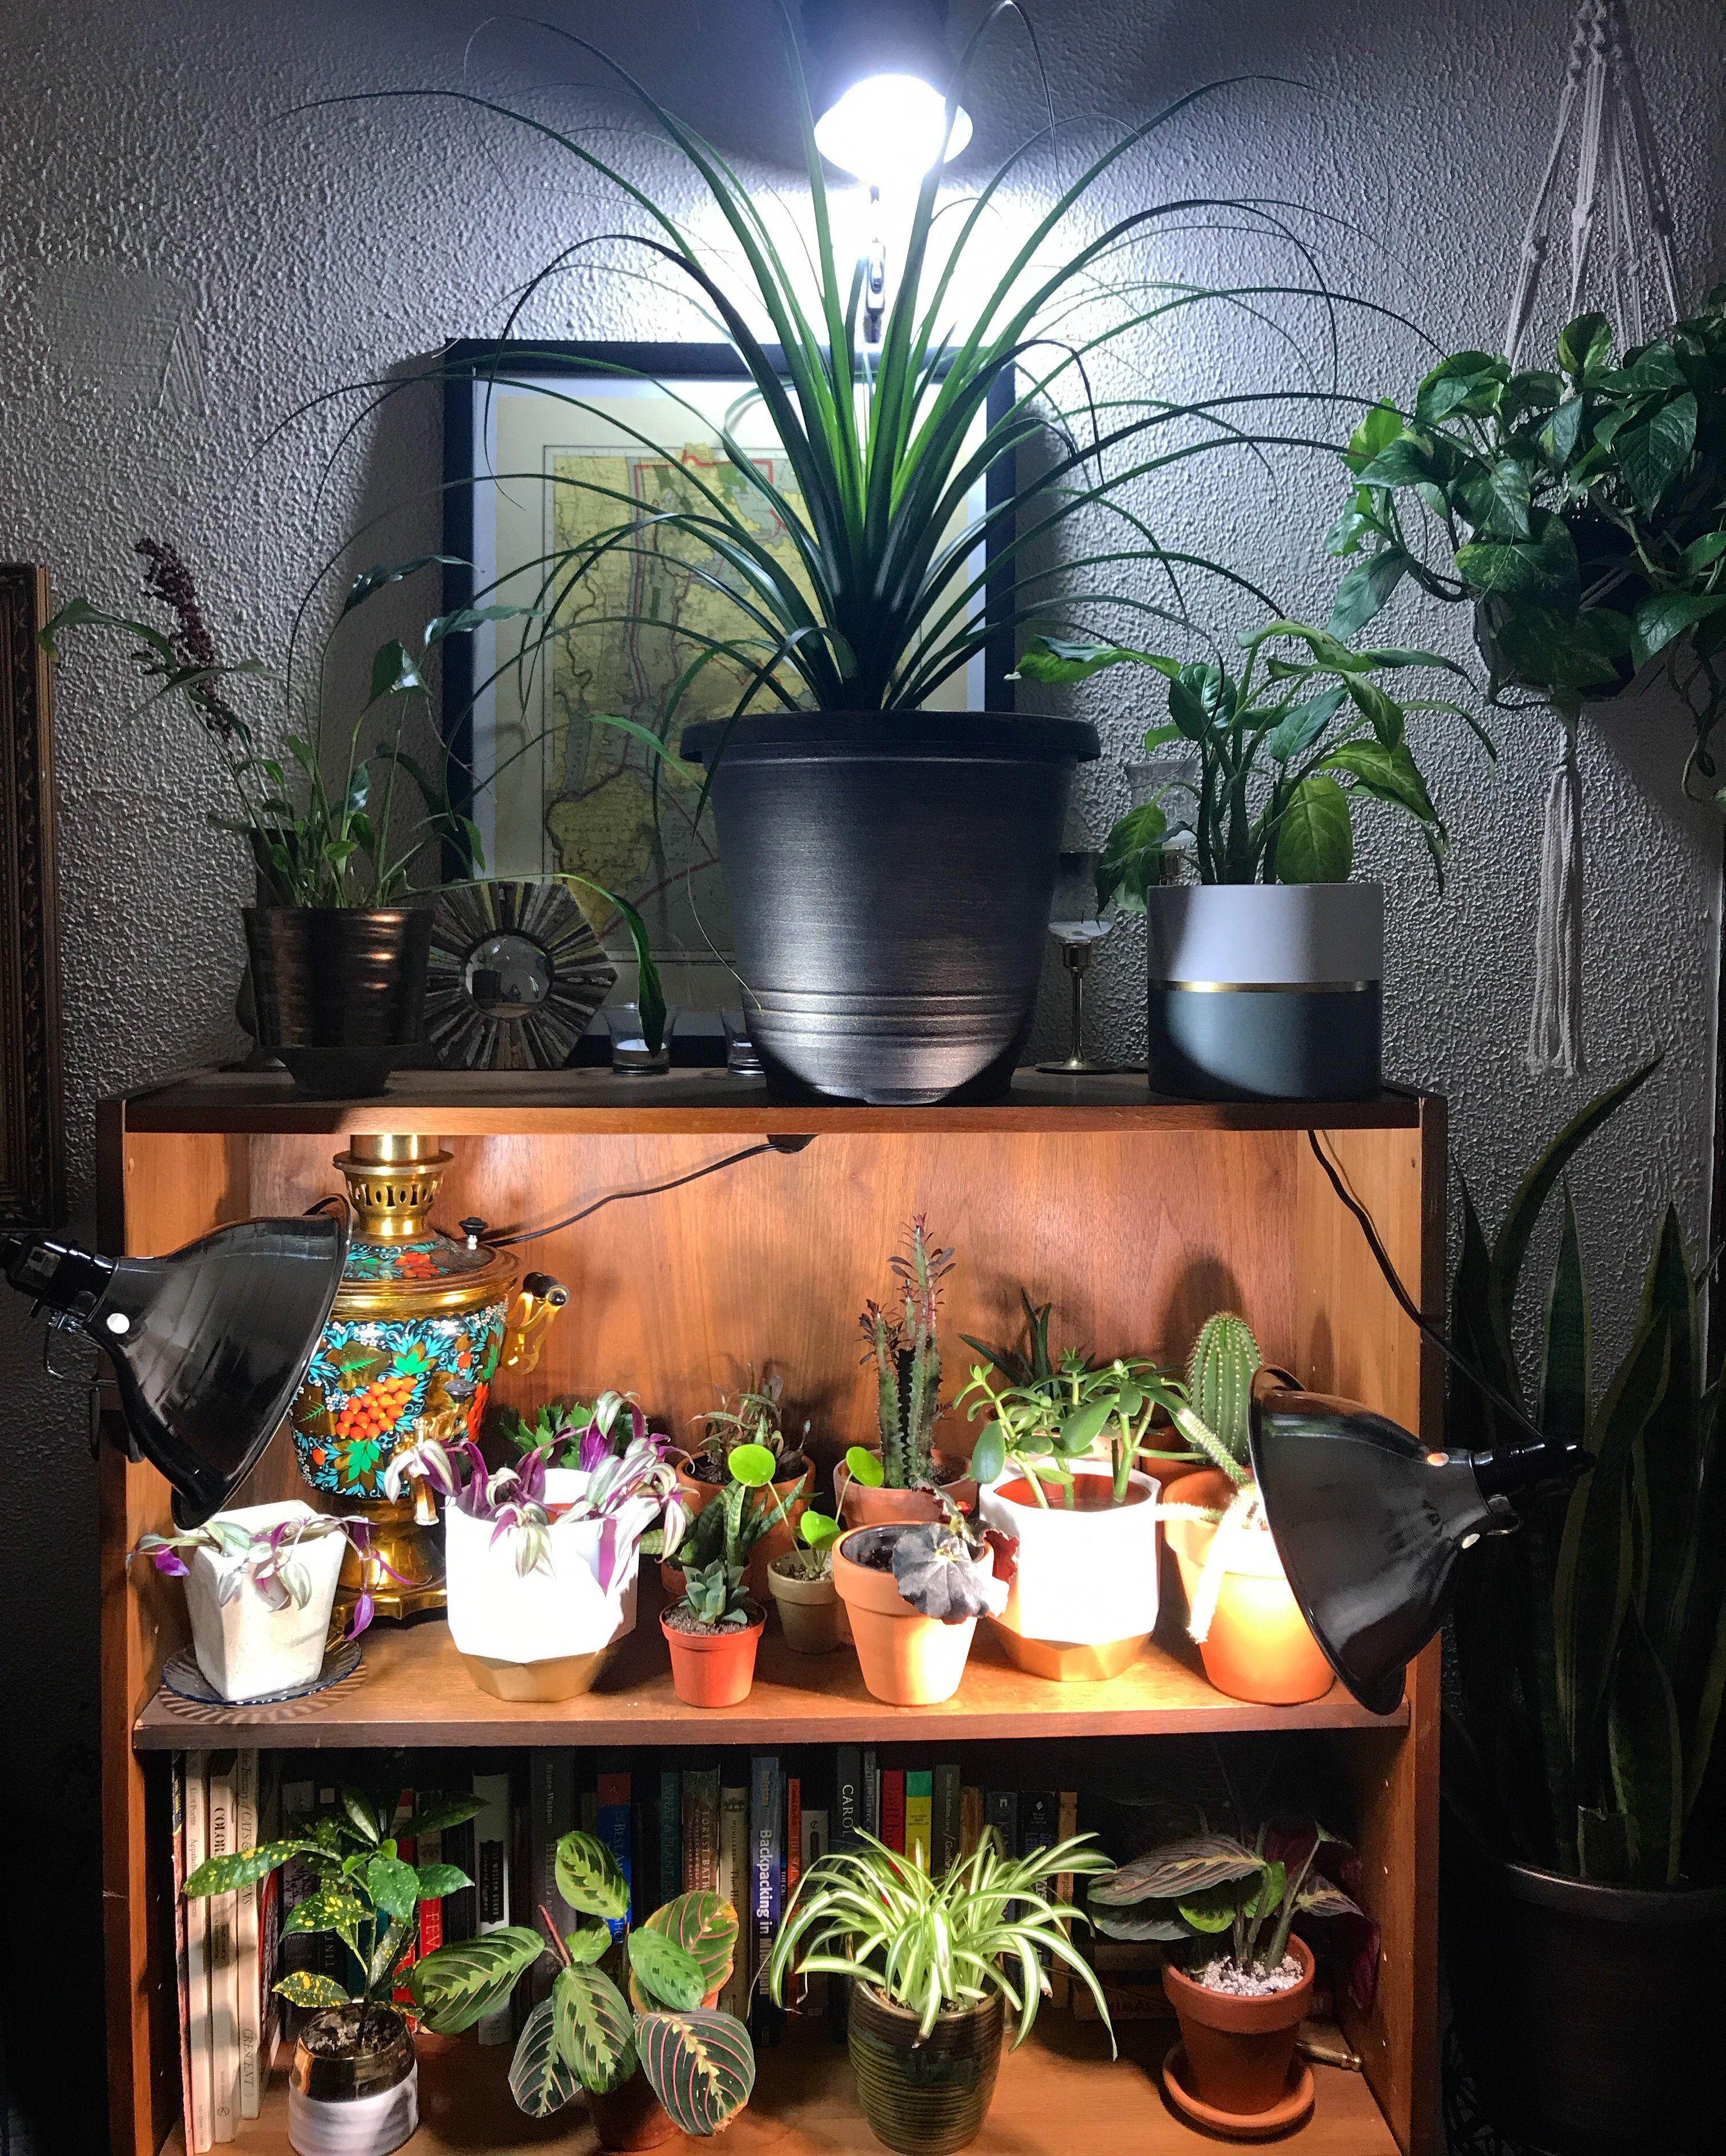 SANSI LED Security Lights, LED Bulbs, Grow Lights (With